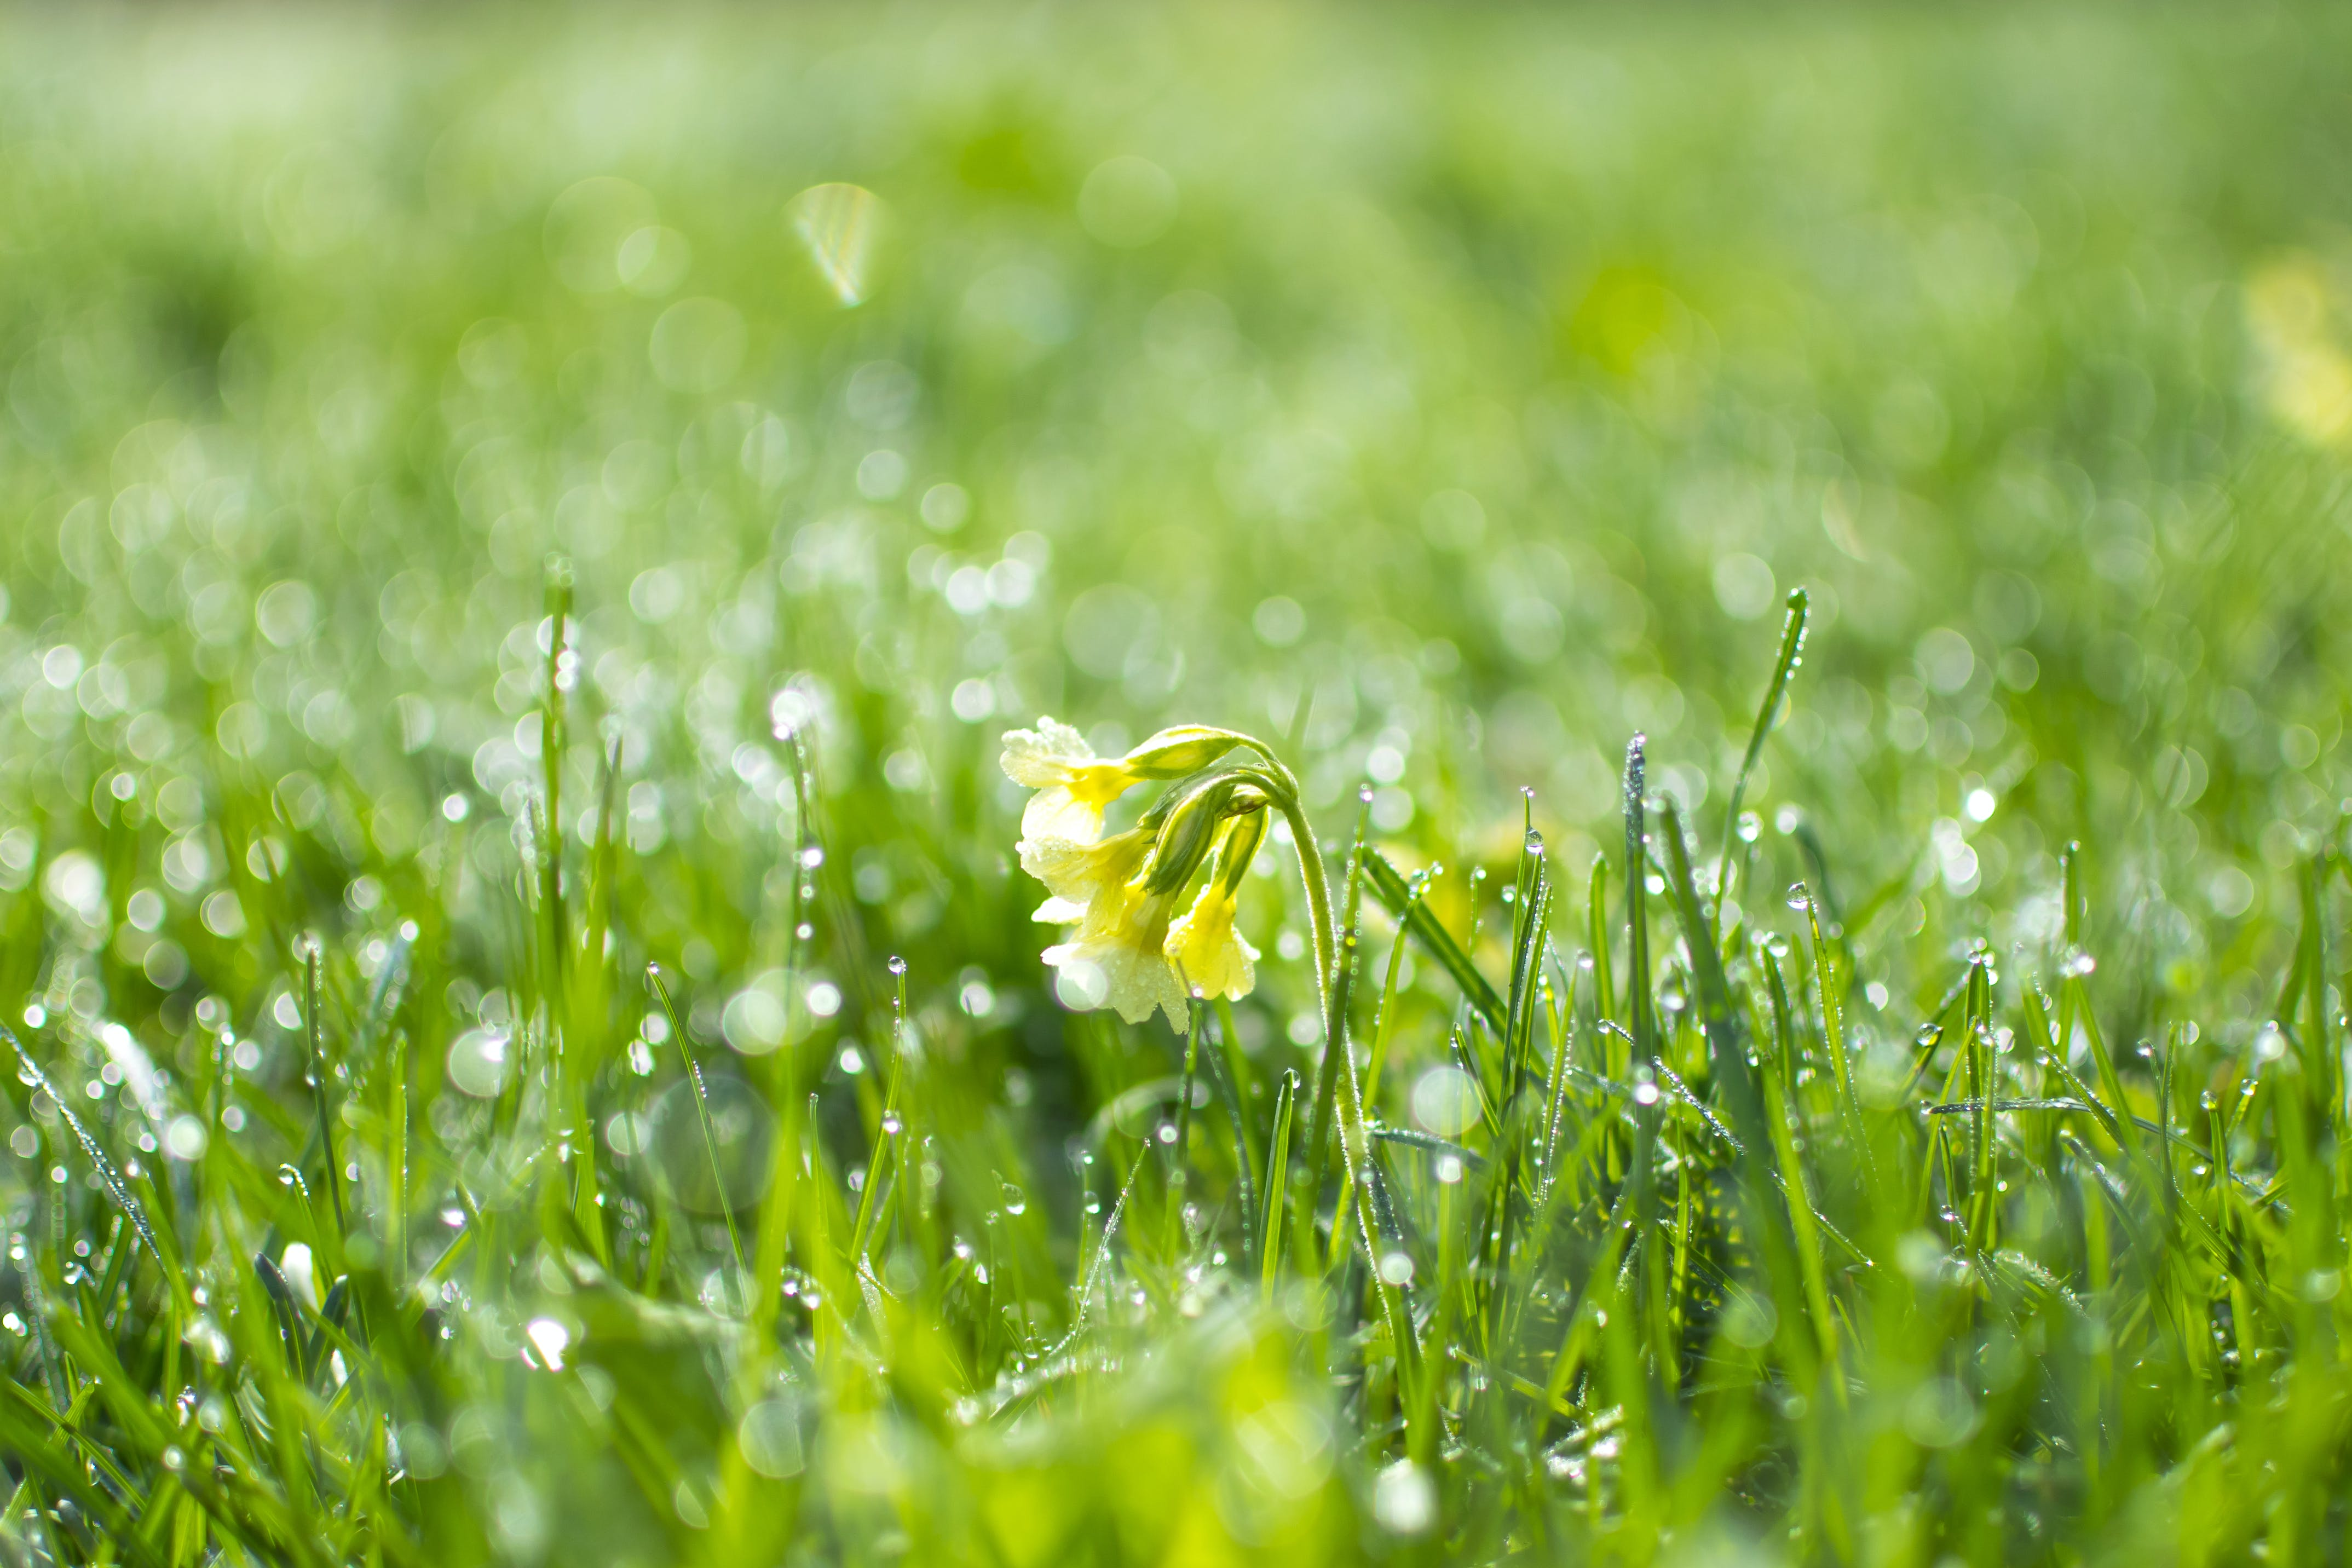 Green Grass at Daytime